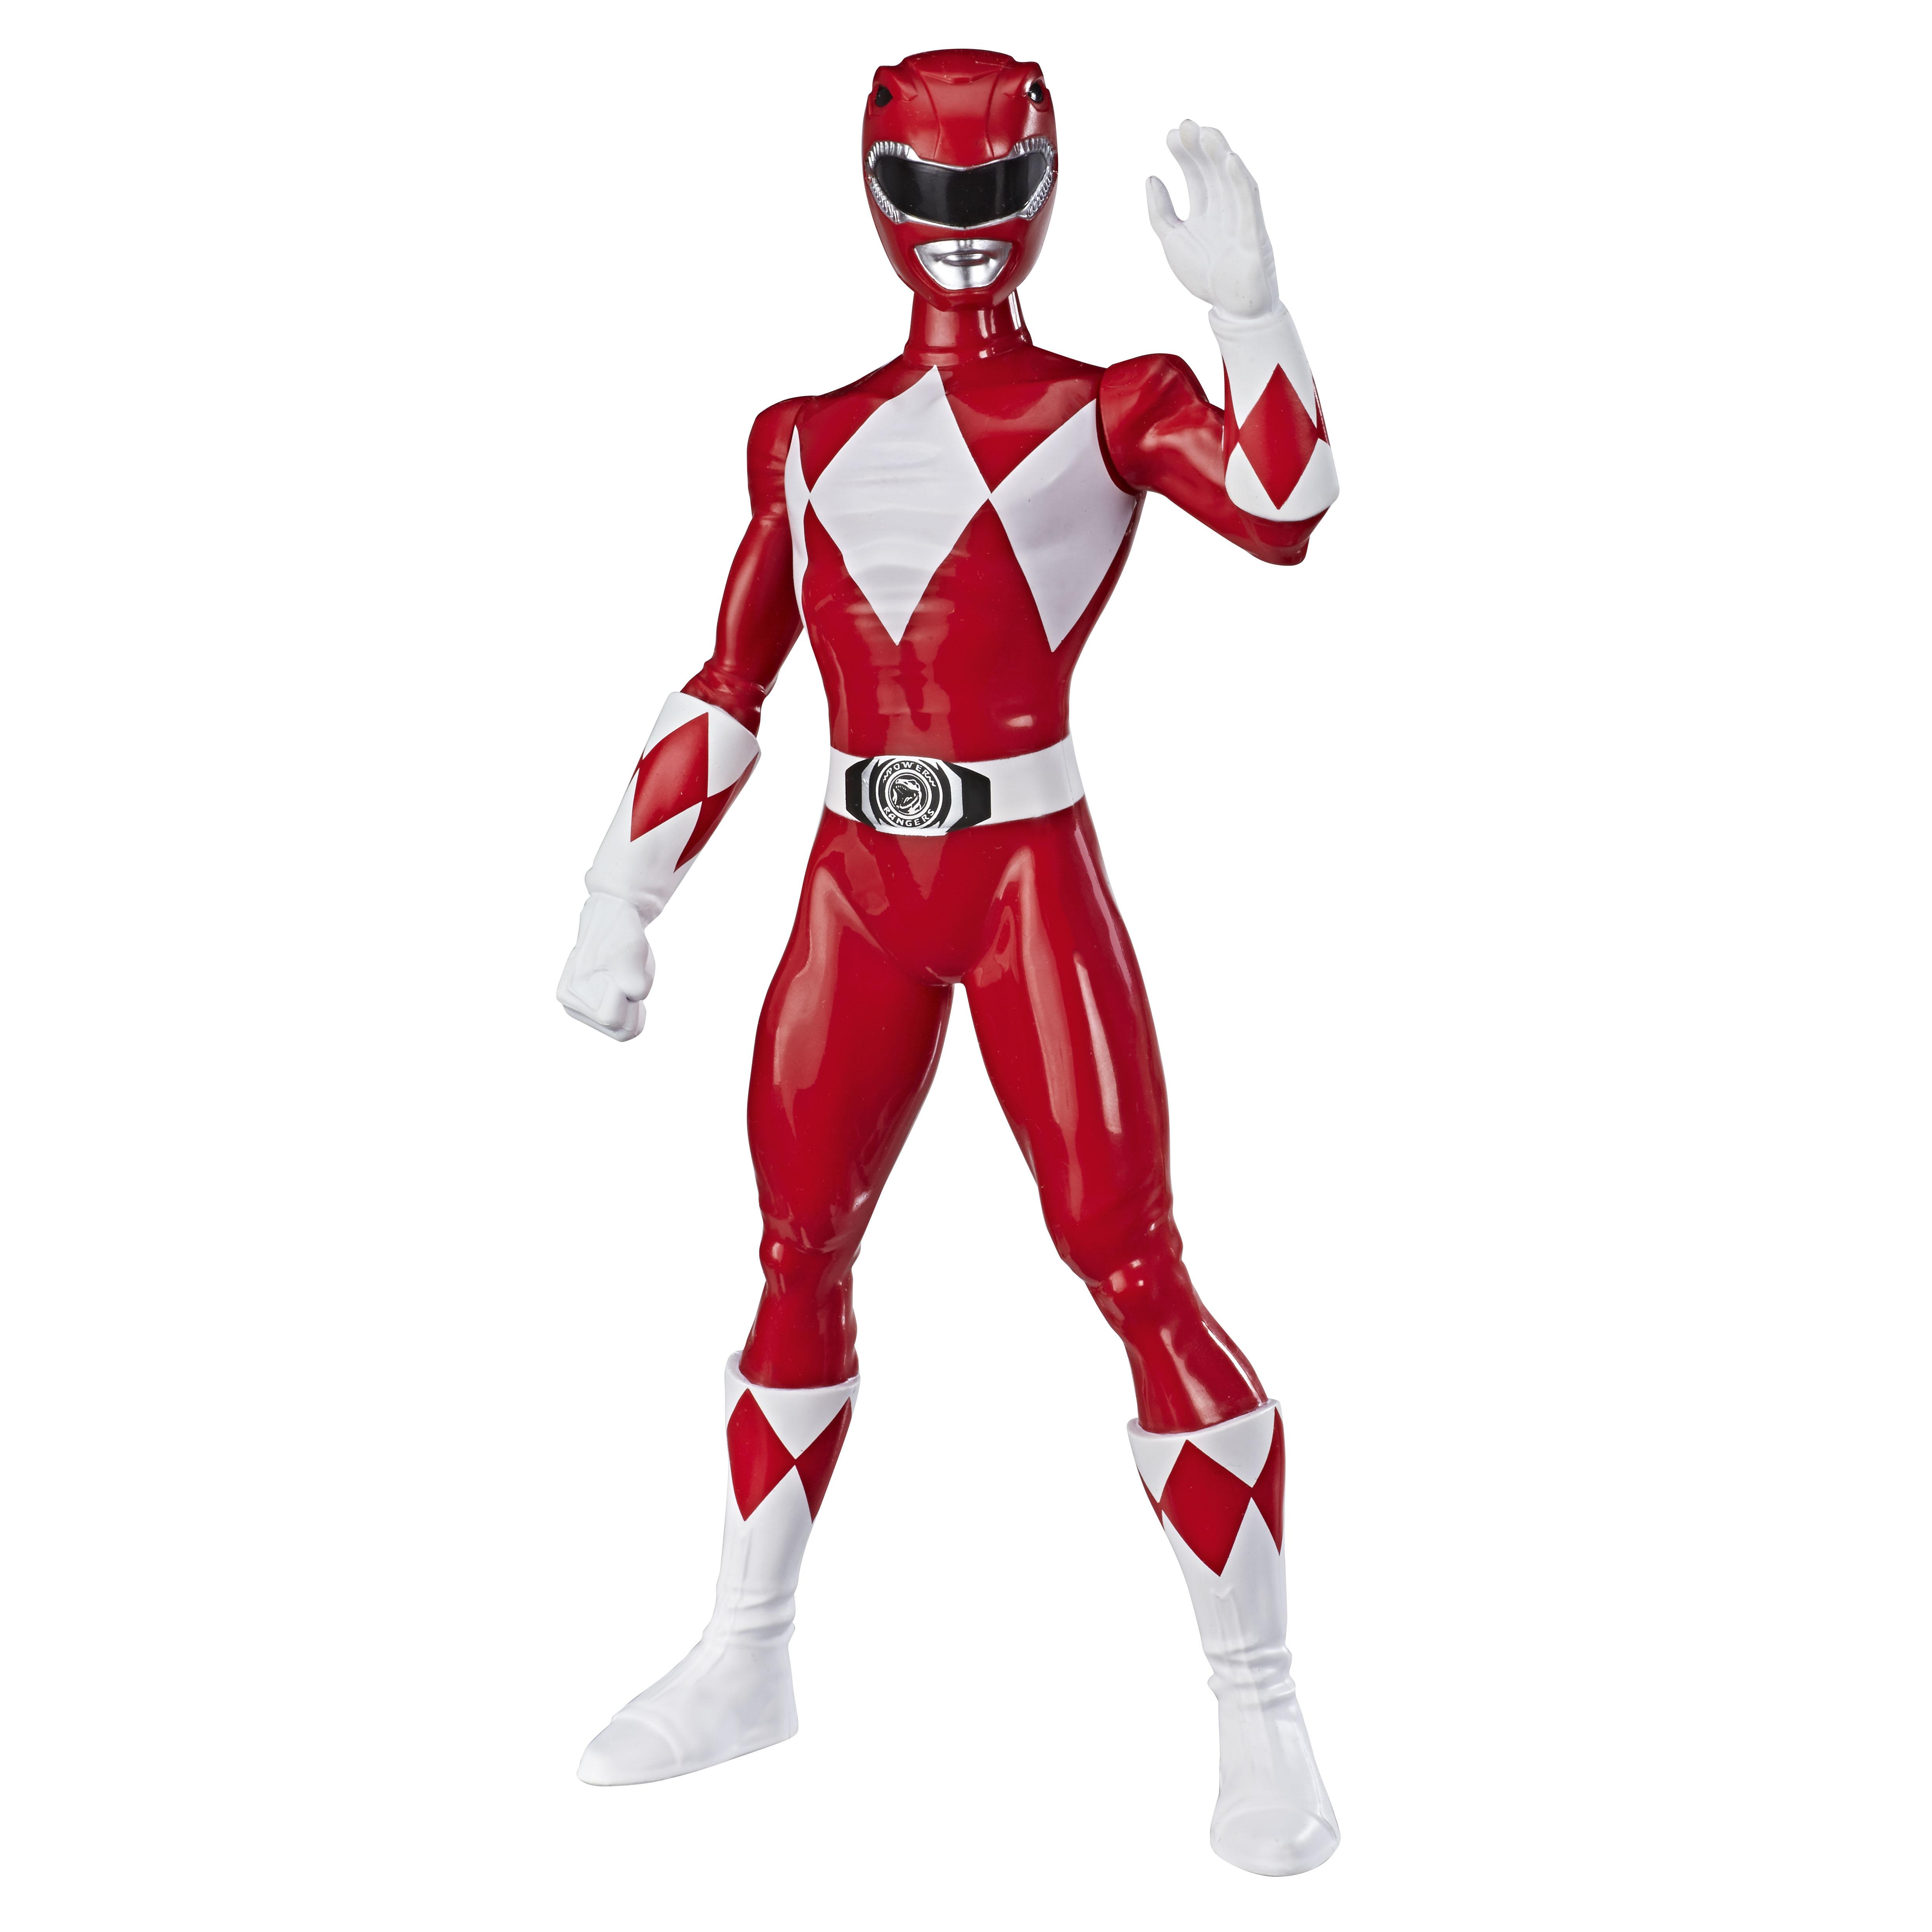 E7897 MMPR 9.5 Inch Basic Figures Red Ranger_OOP